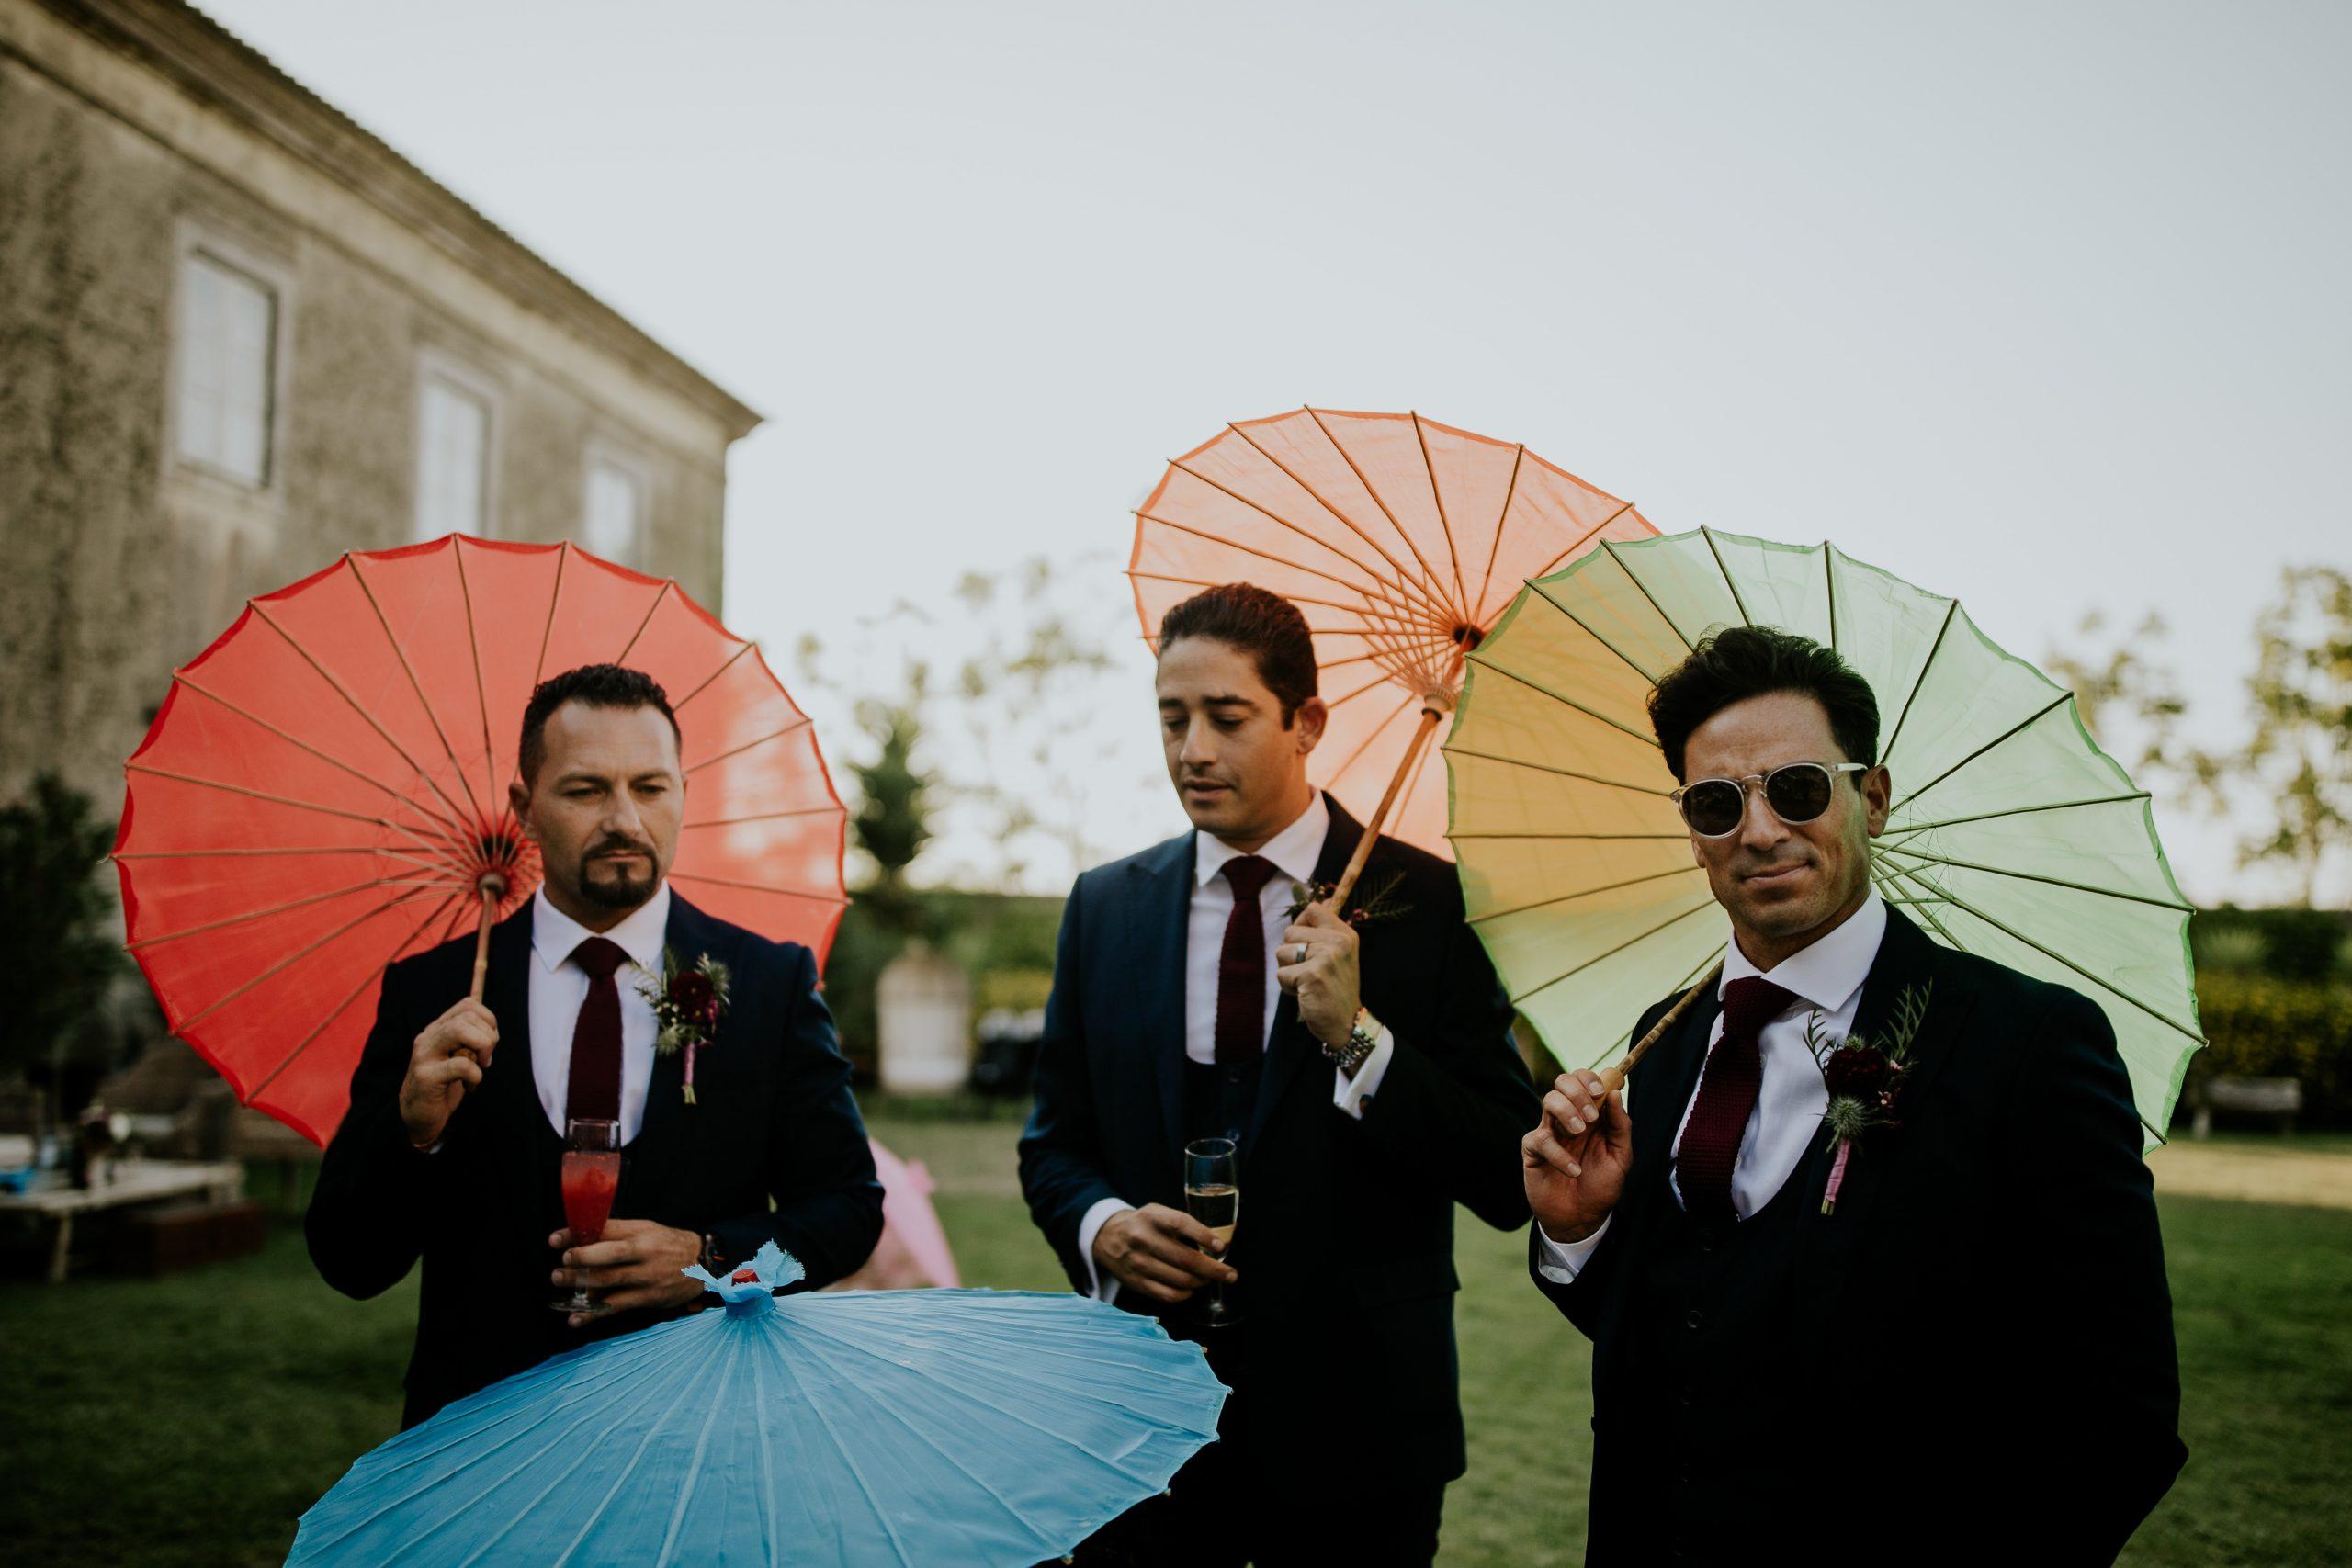 three man with colour umbrellas